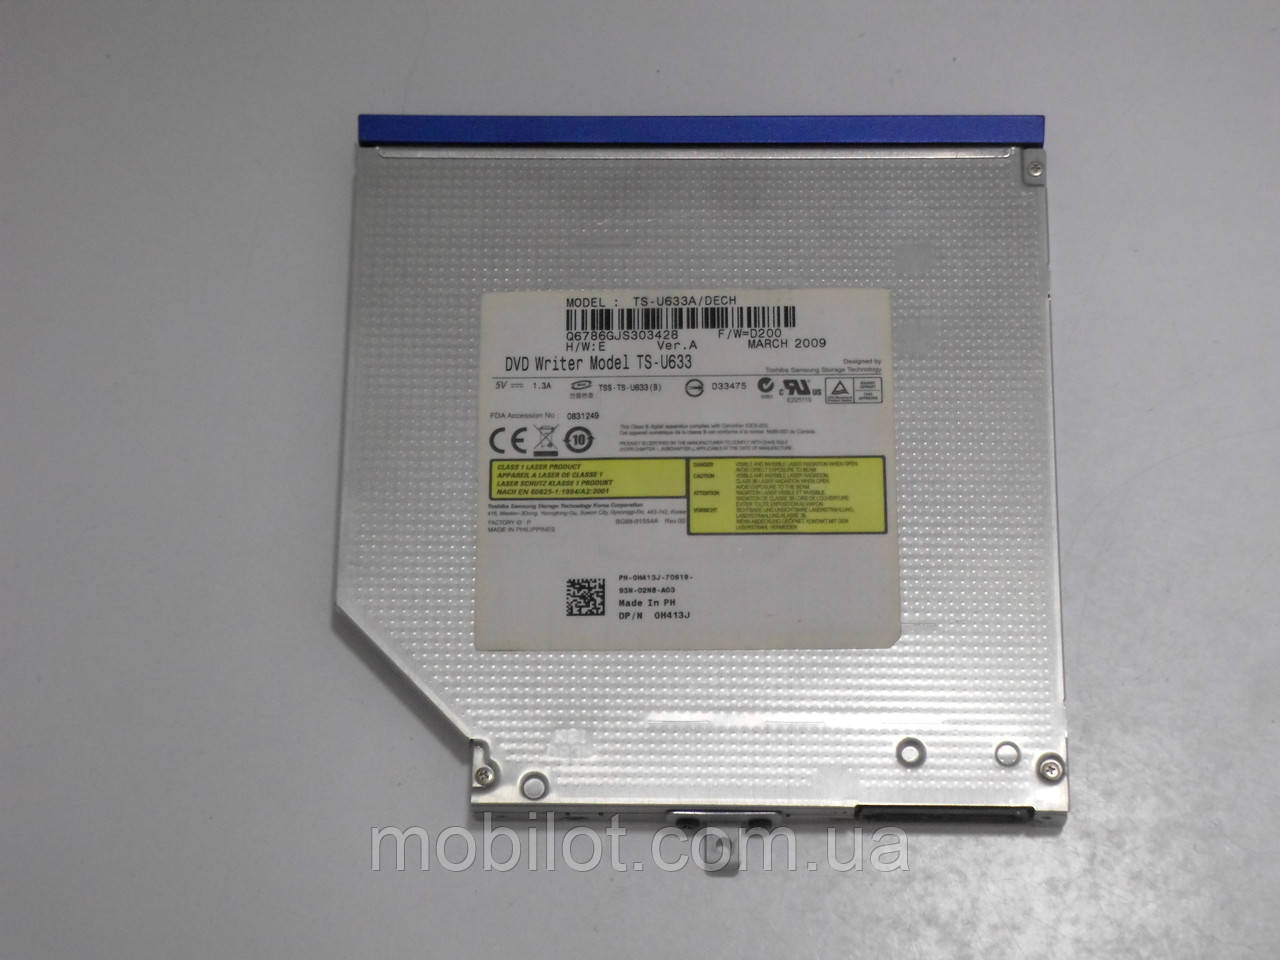 Оптический привод Dell E4300 (NZ-7542)